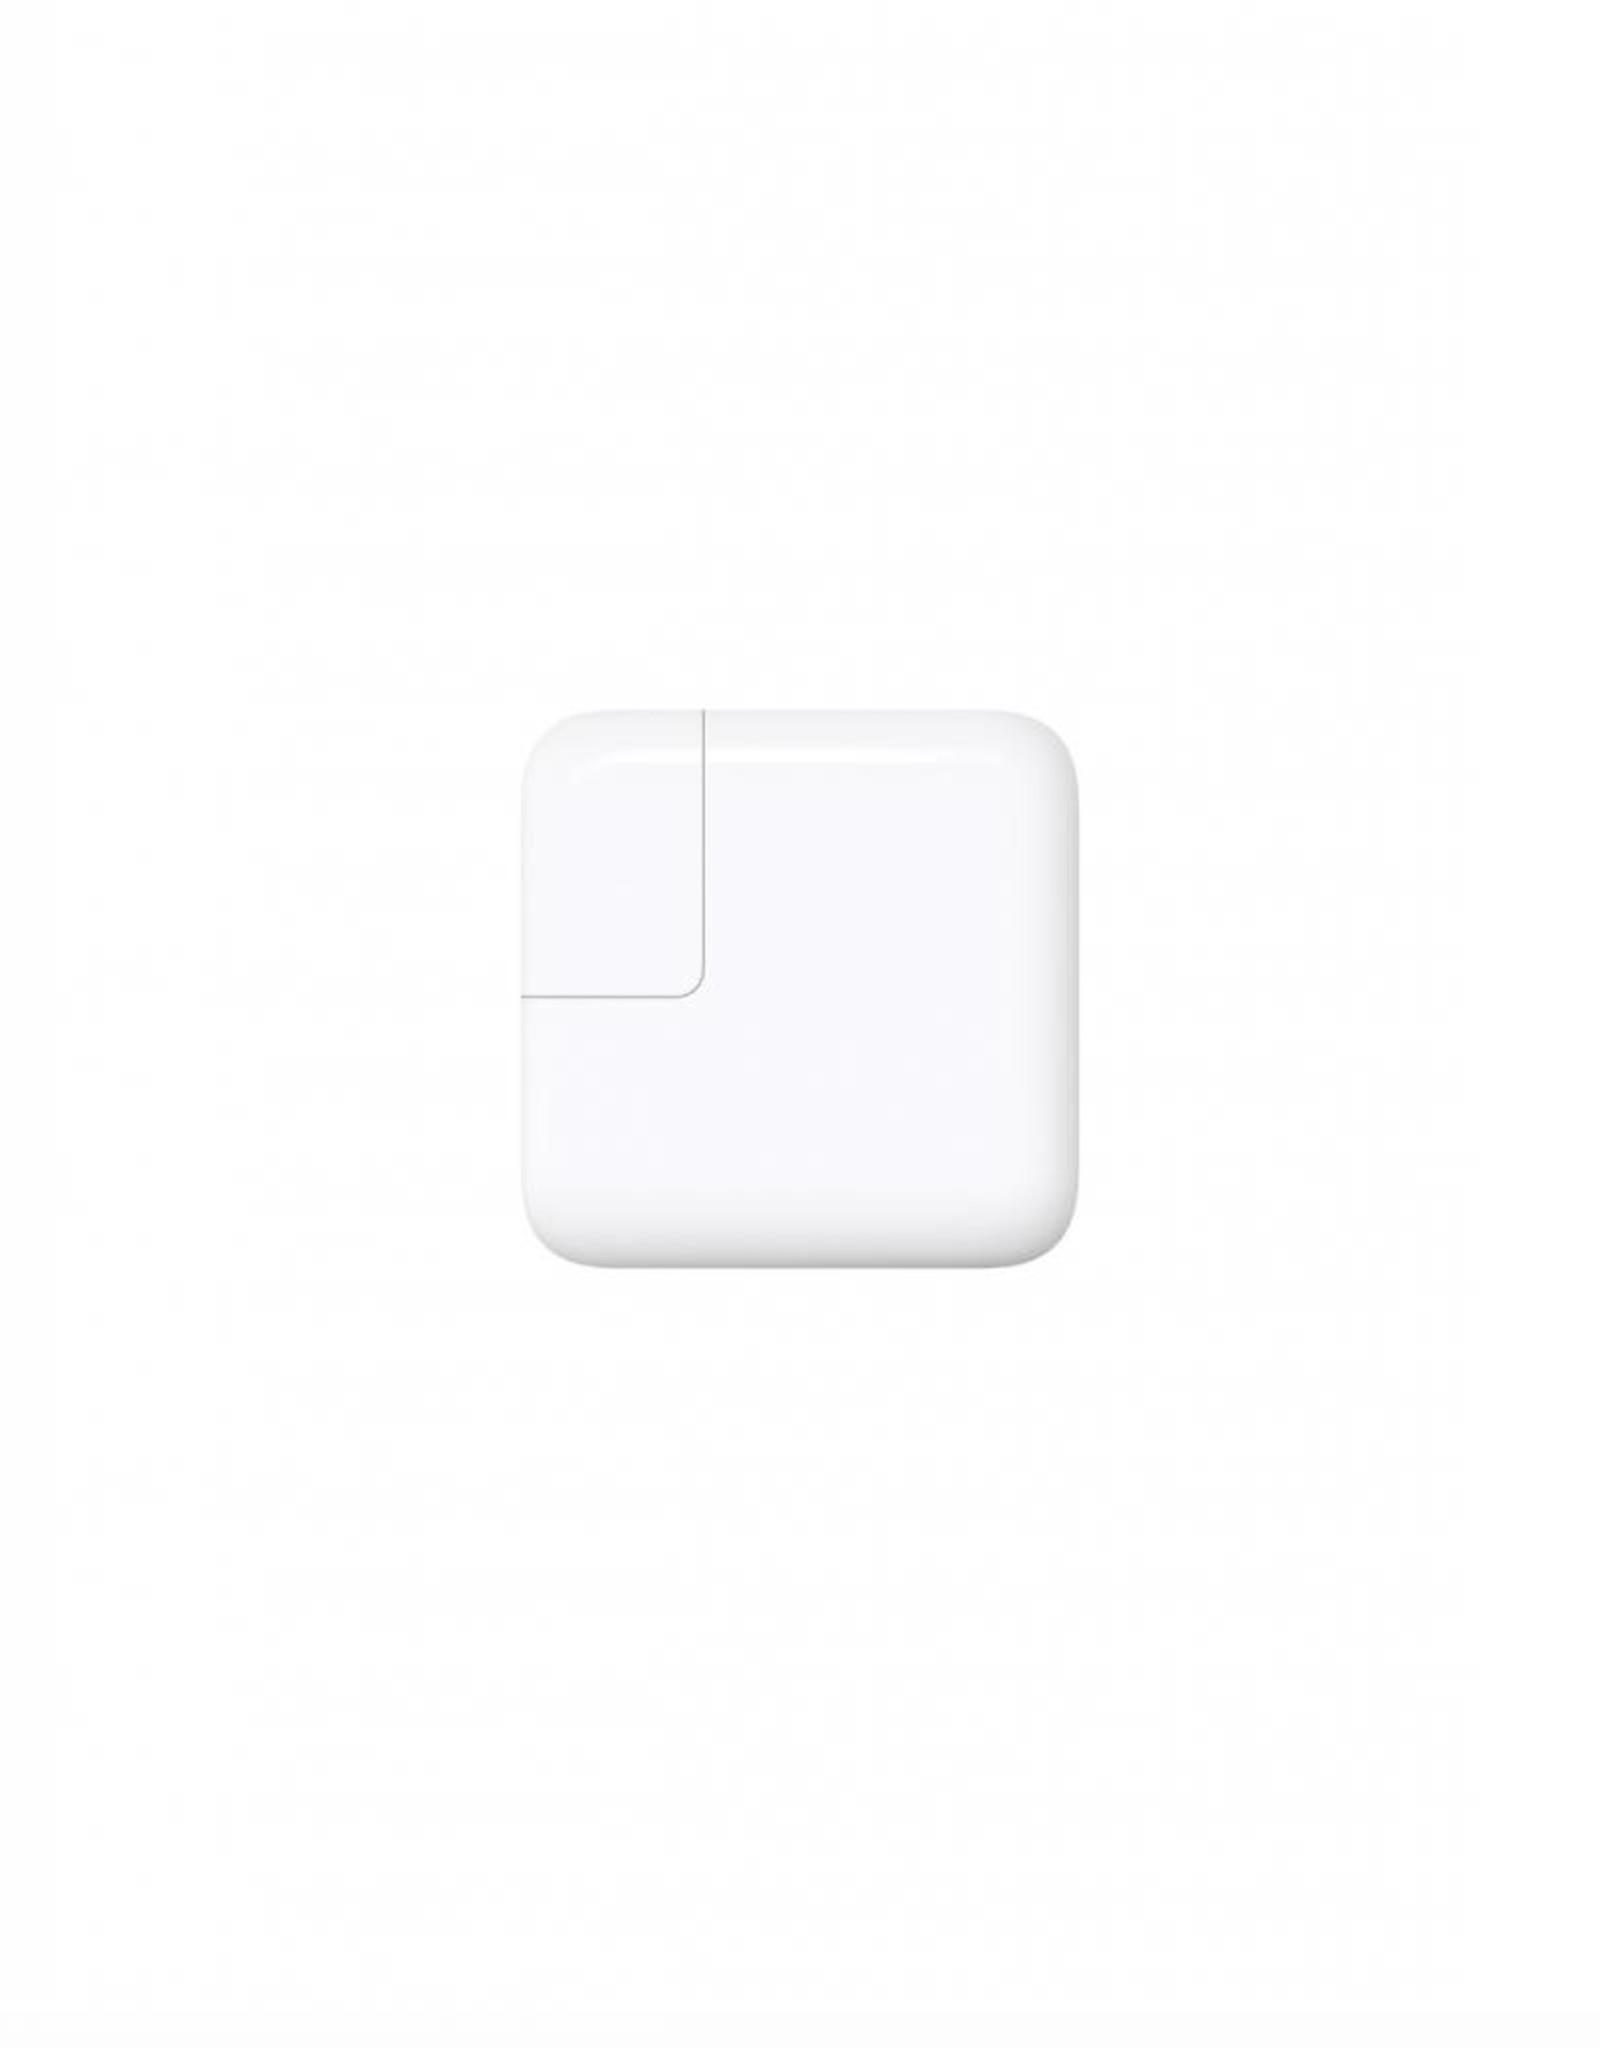 Apple APPLE 29W USB-C POWER ADAPTER (MACBOOK)